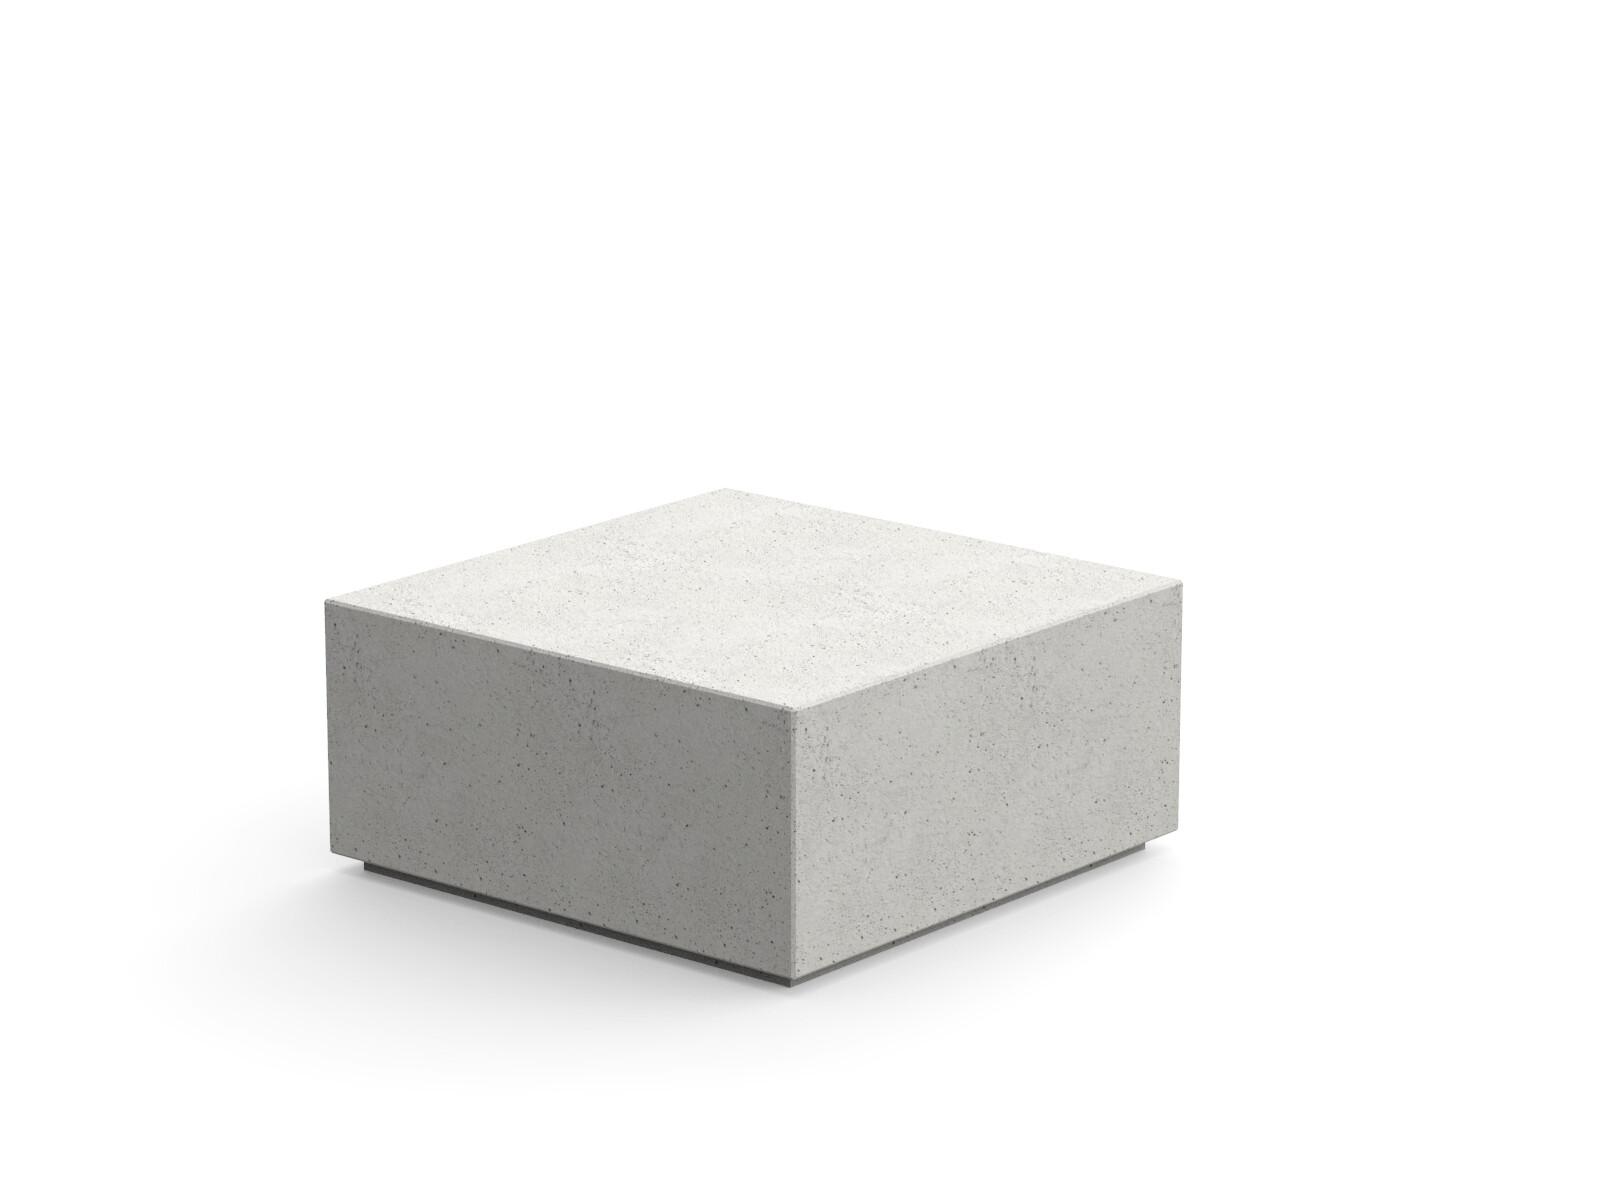 Log beton zitelement straatmeubilair van hoge kwaliteit